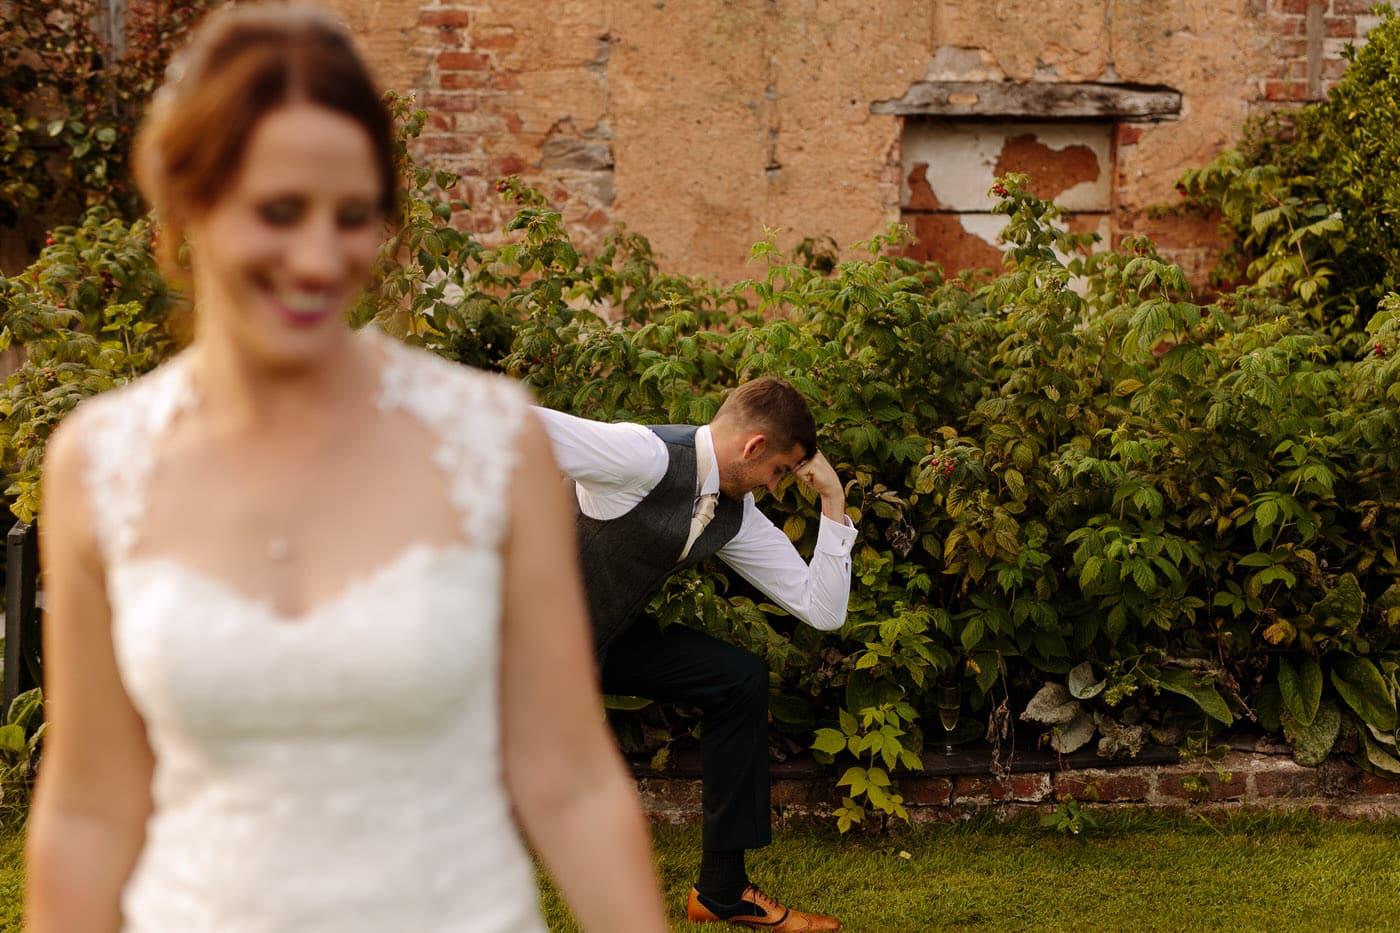 AA PENTREMAWRNORTH WALES WEDDING 2125